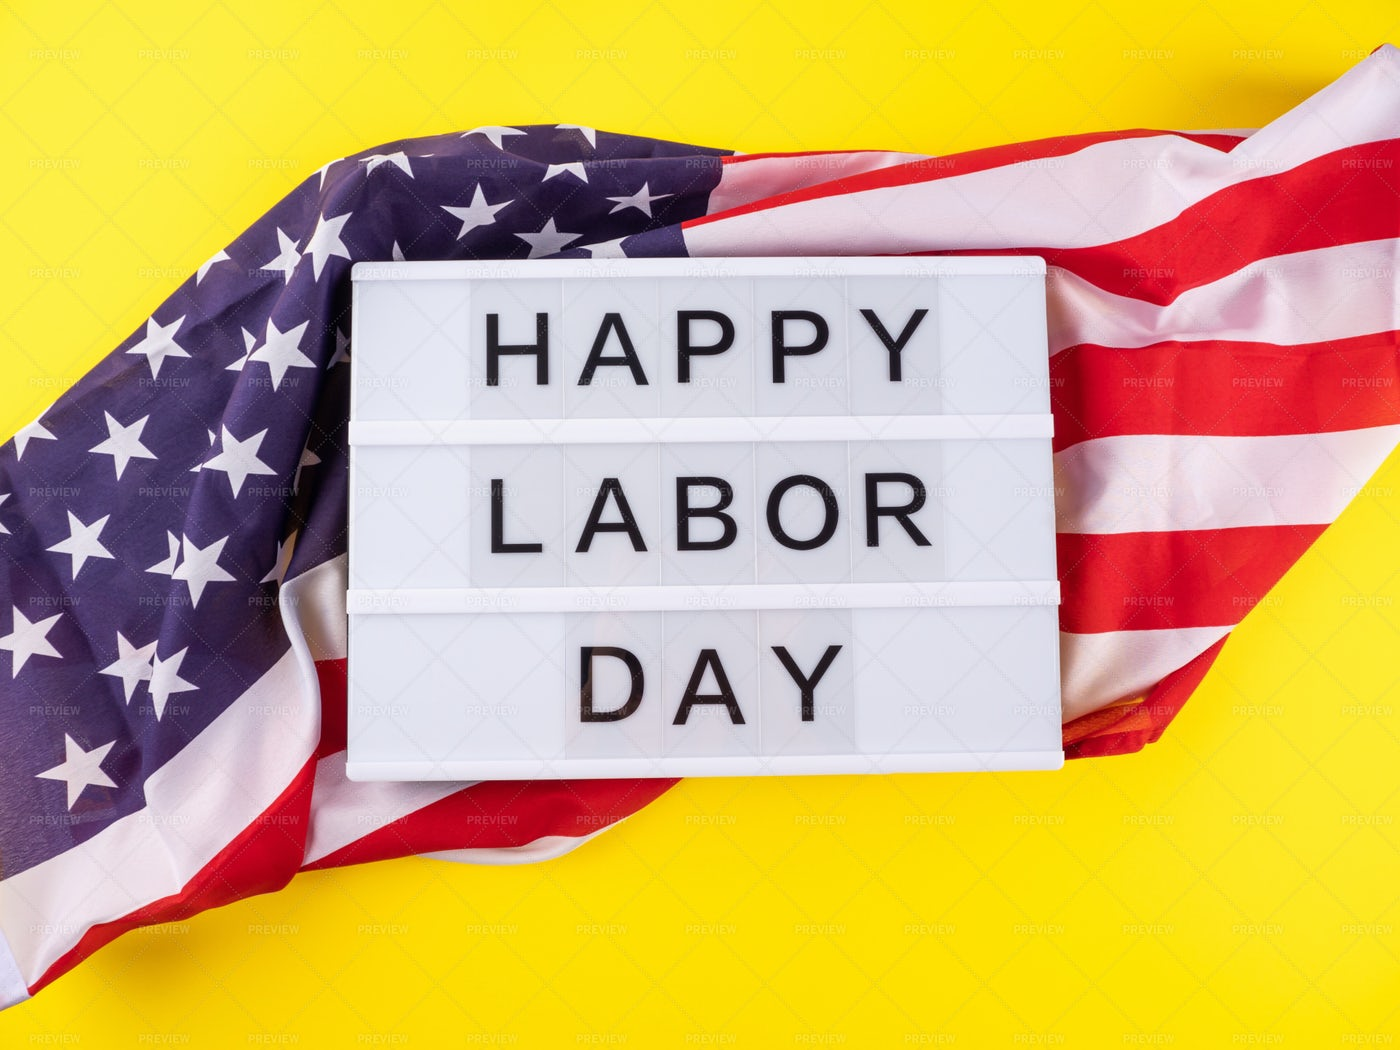 Happy Labor Day Lightbox: Stock Photos